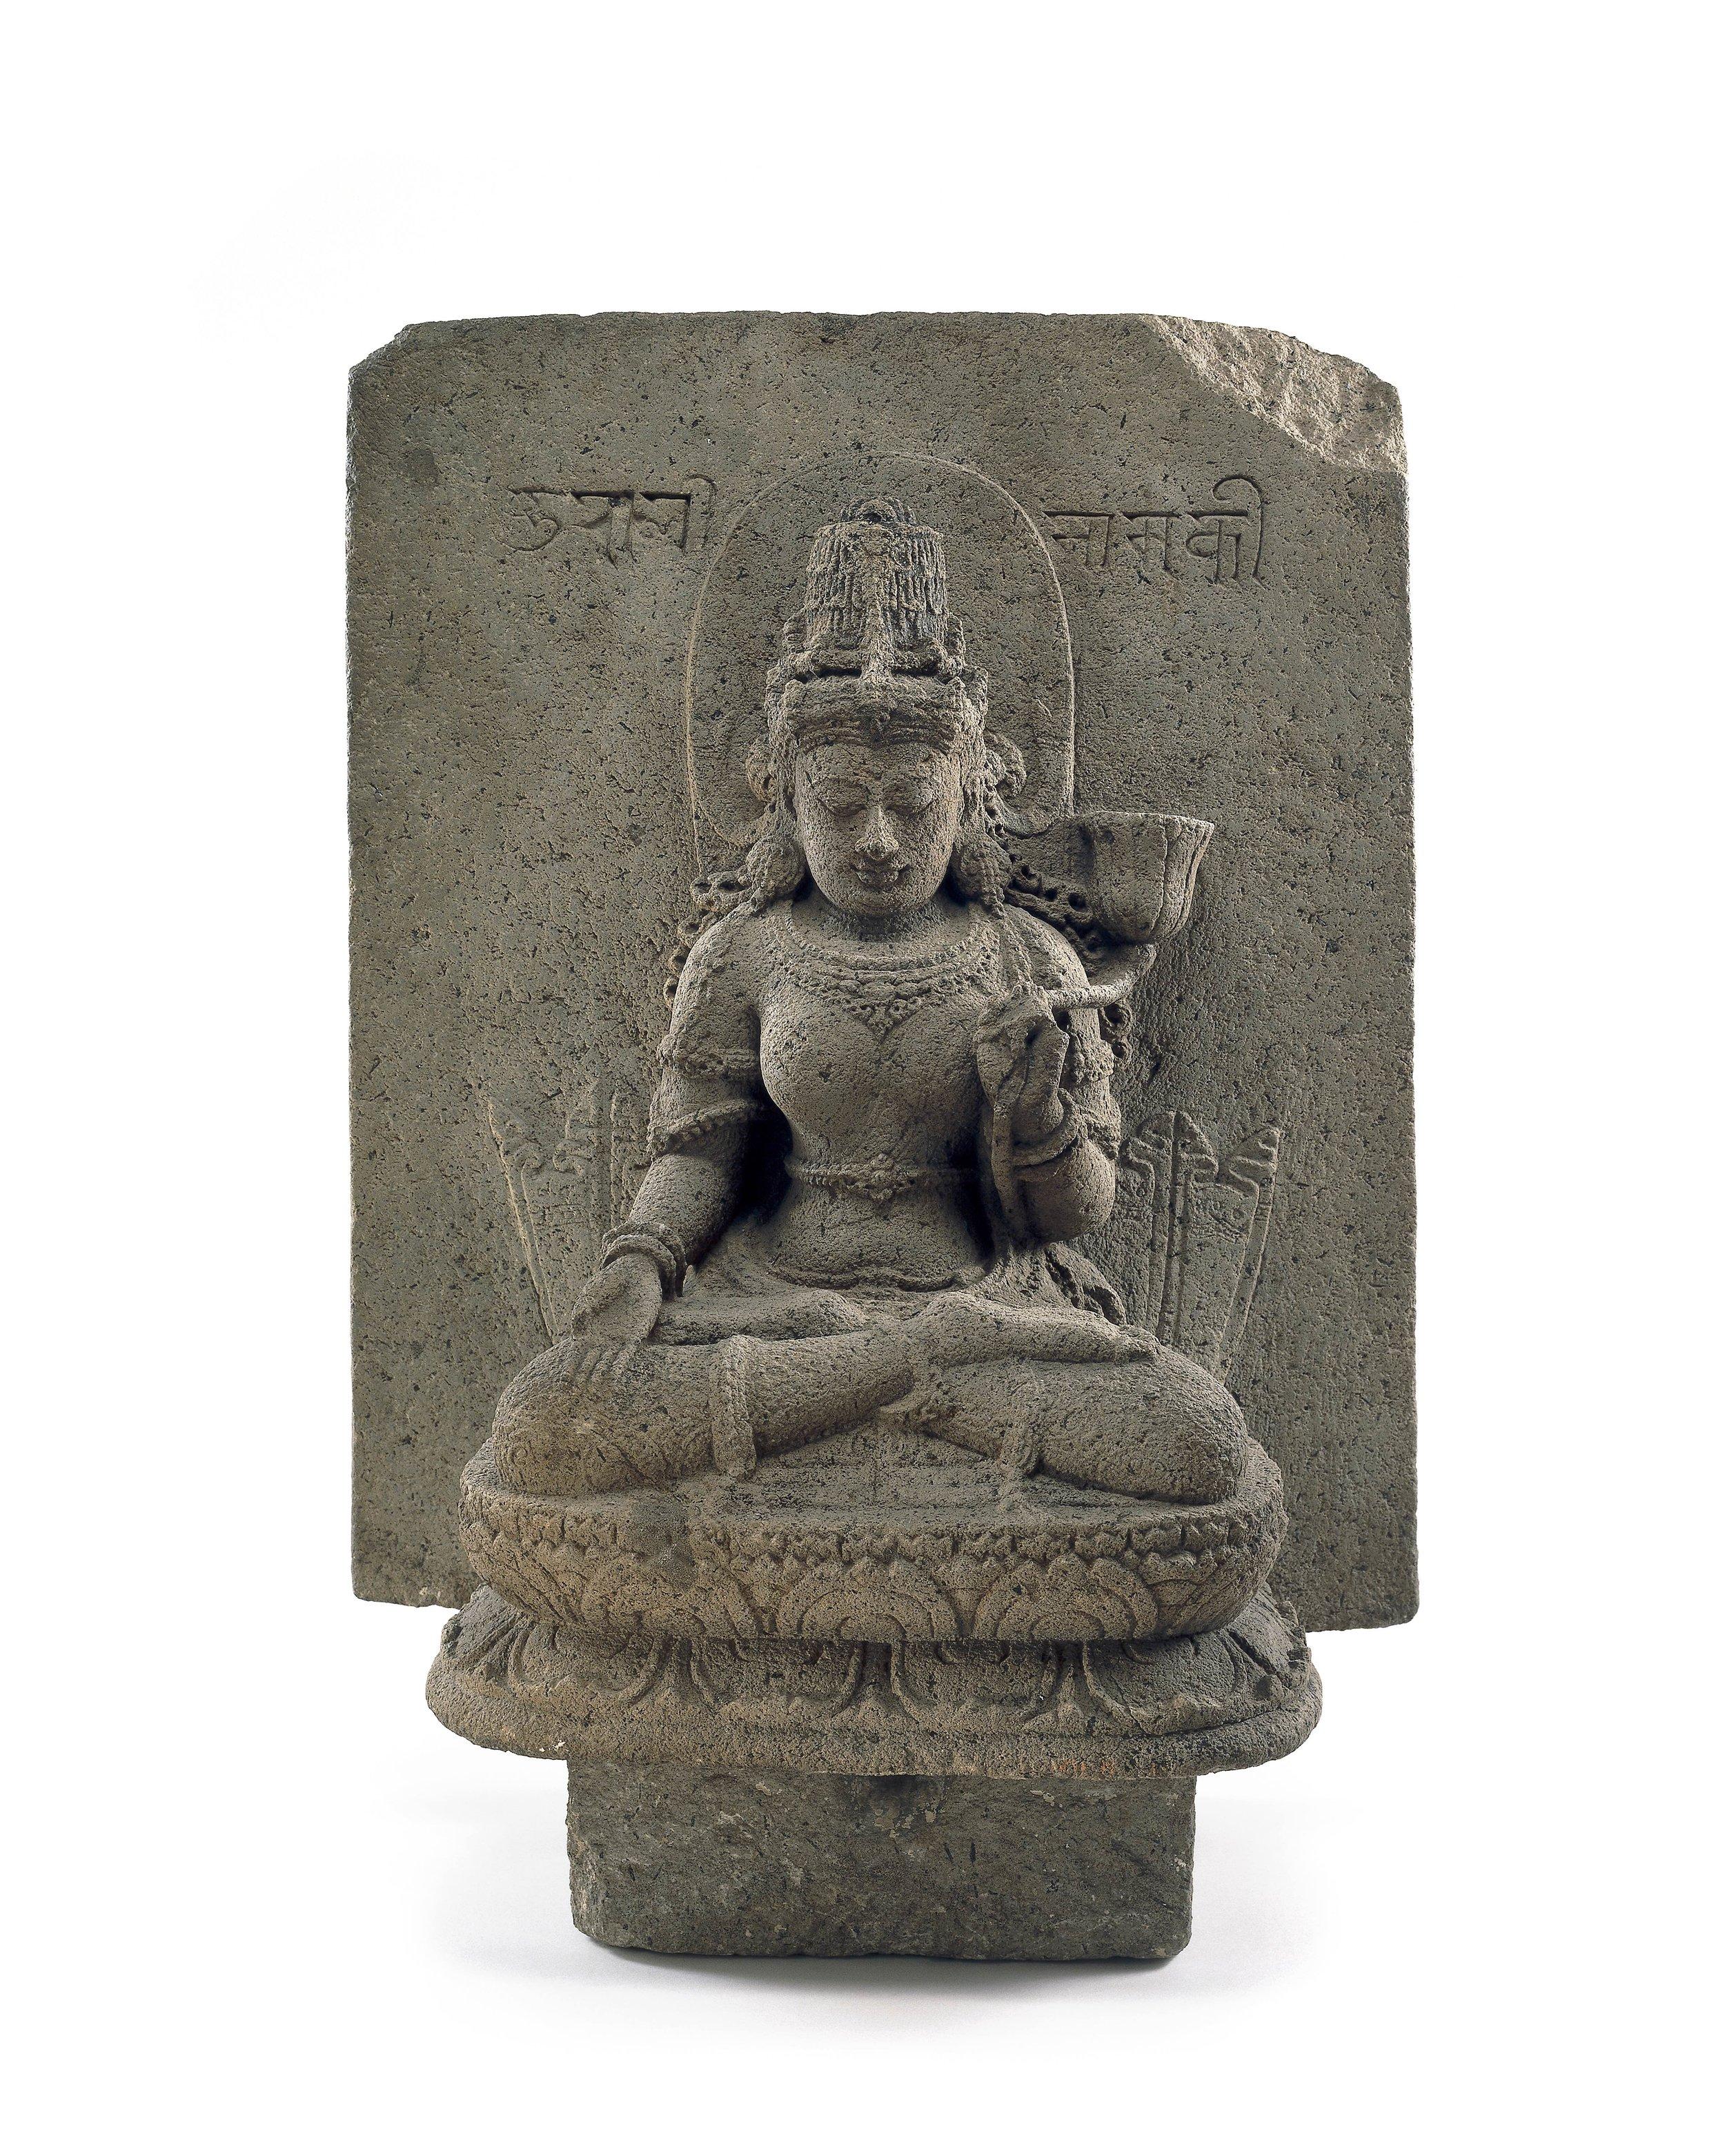 Mamaki © The Trustees of the British Museum